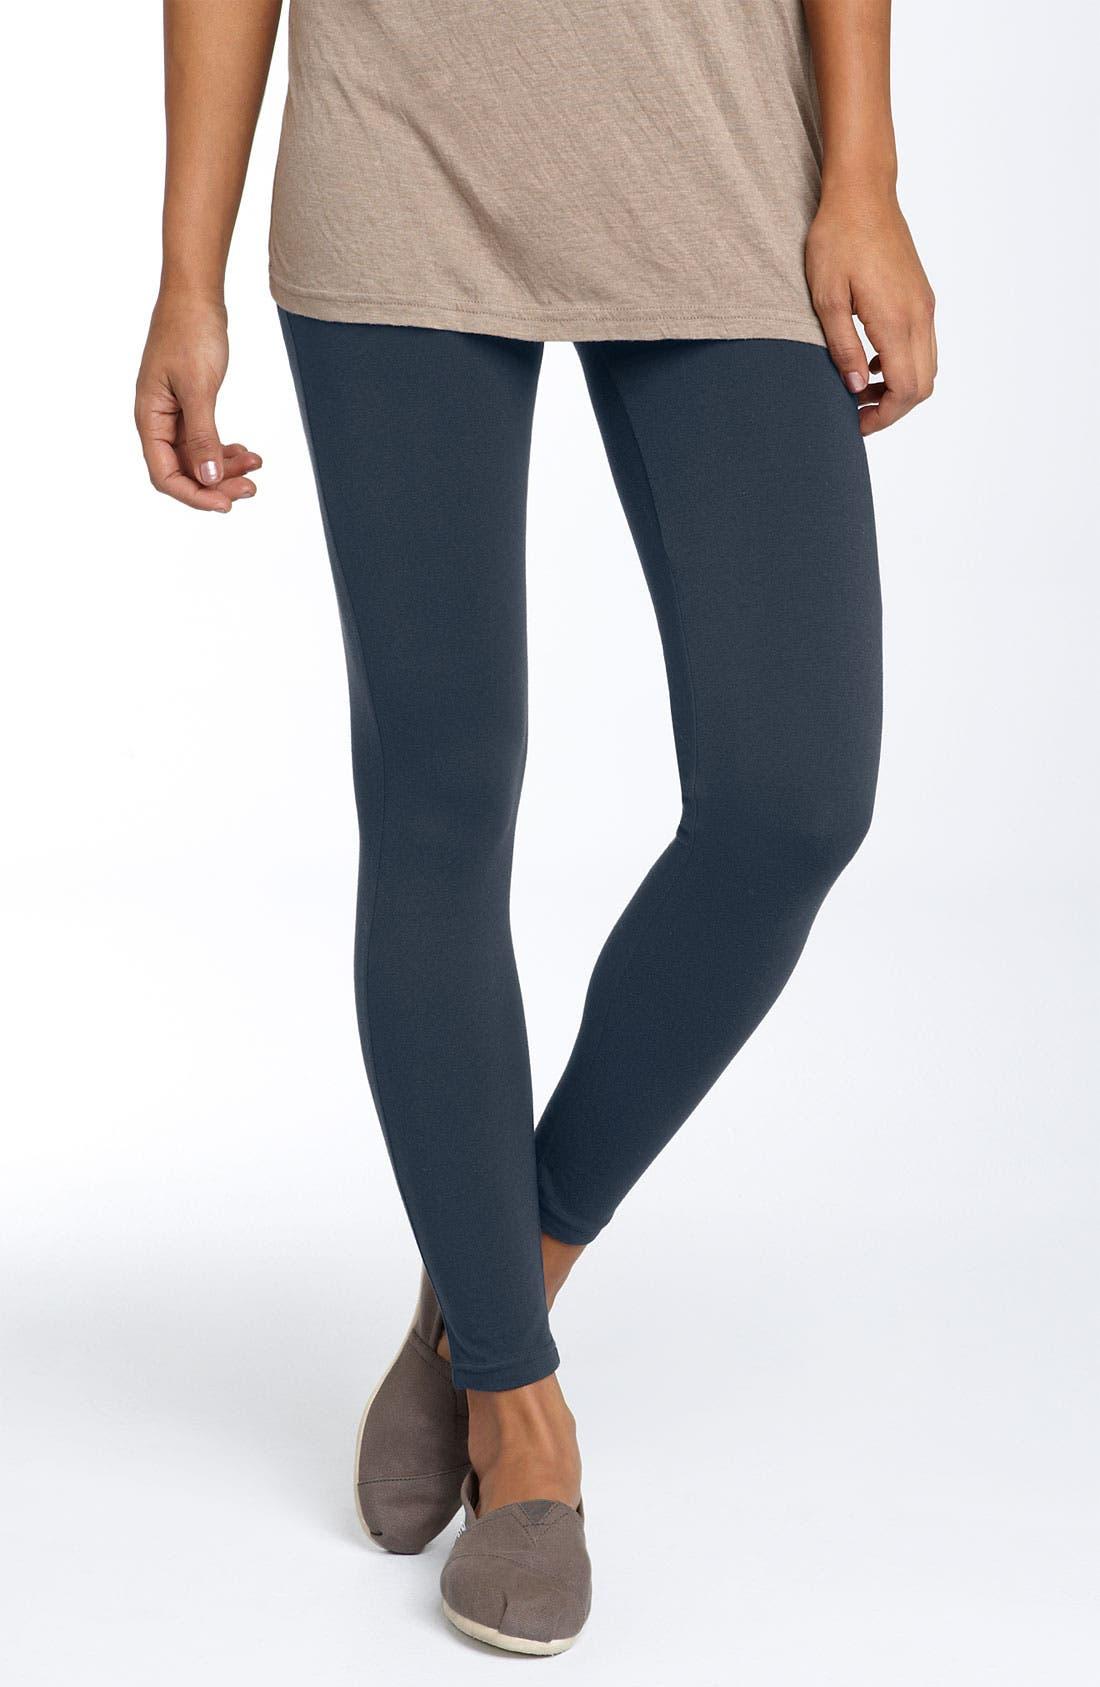 Alternate Image 1 Selected - BP. 'Turn Back' Stretch Cotton Leggings (Juniors)